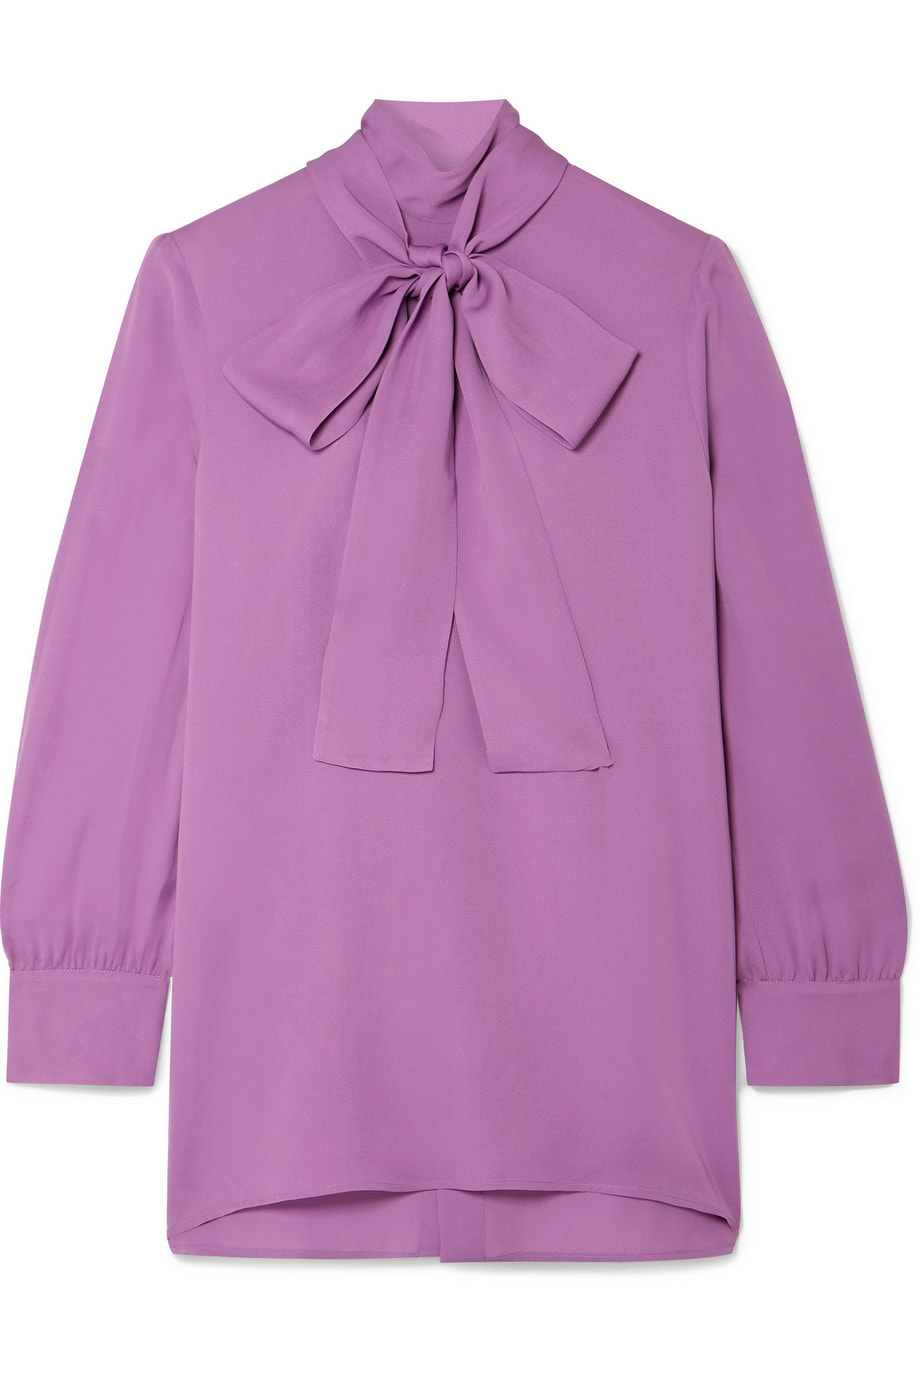 gucci-purple-pussy-bow-silk-crepe-blouse_orig.jpg